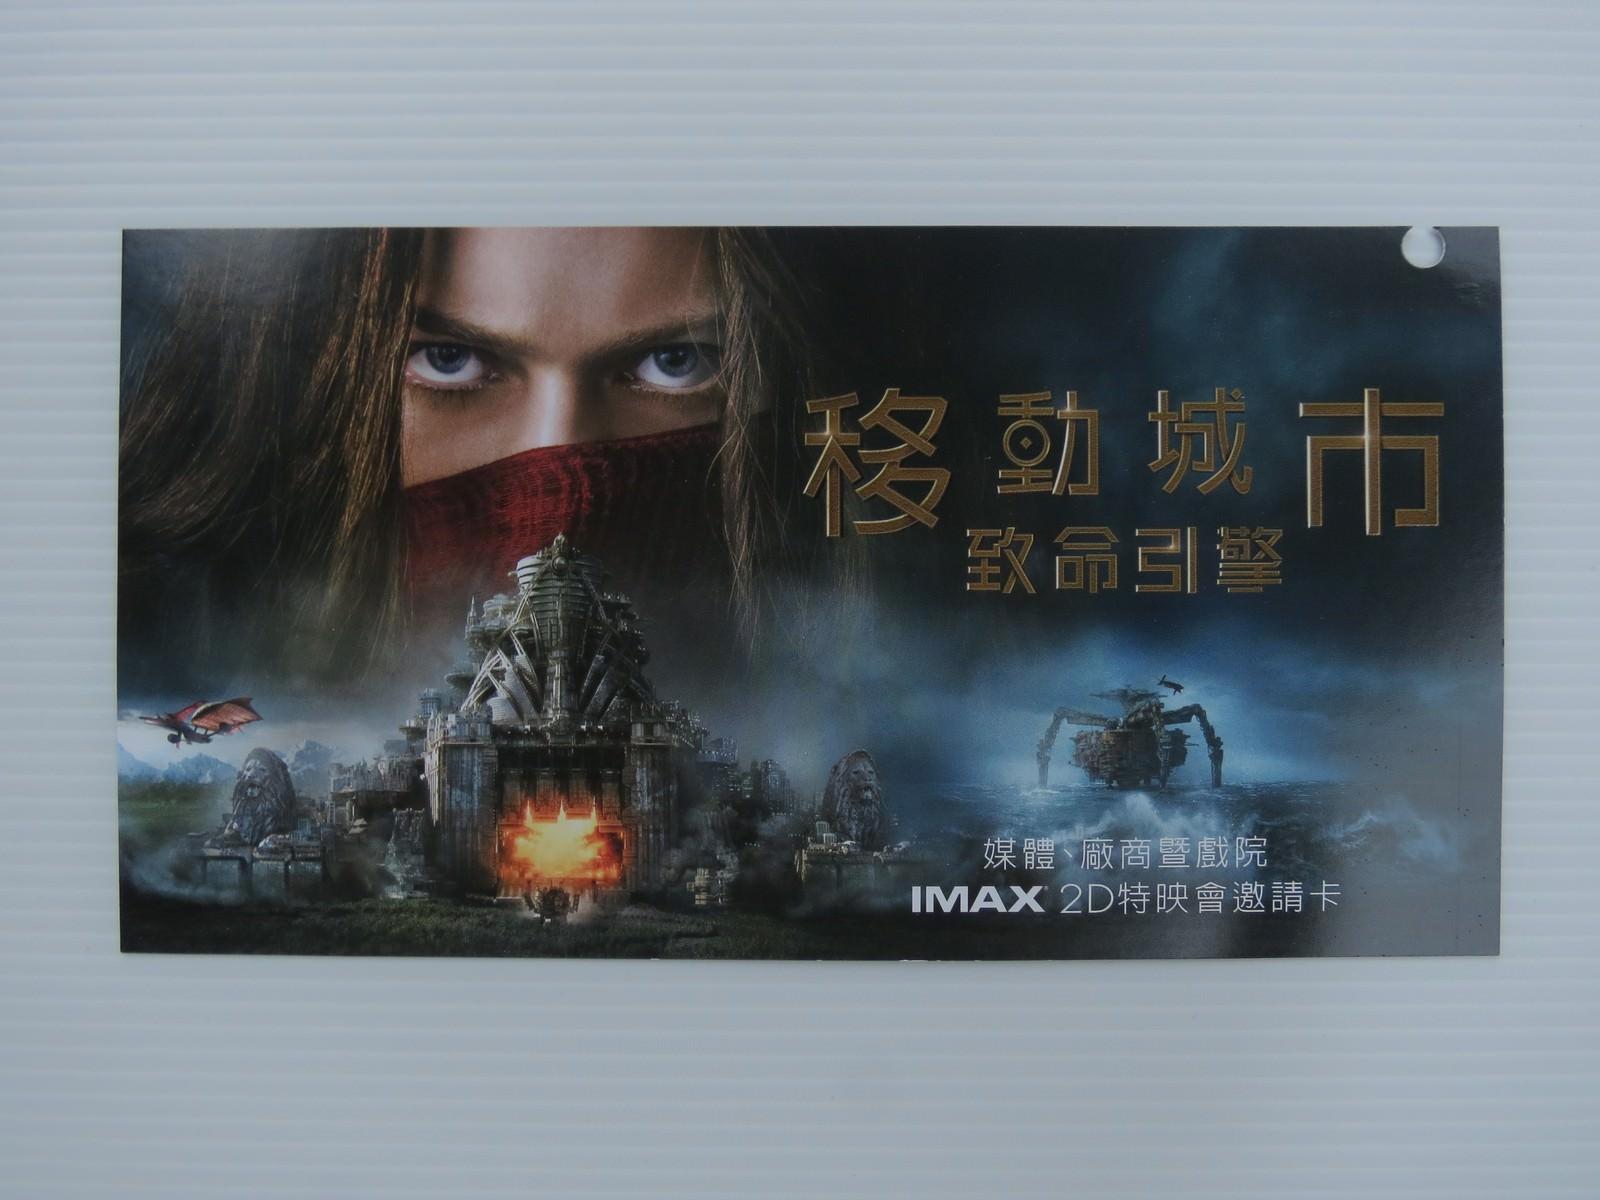 Movie, Mortal Engines(美國, 2018年) / 移動城市:致命引擎(台灣.香港) / 掠食城市(網路), 特映會邀請卡